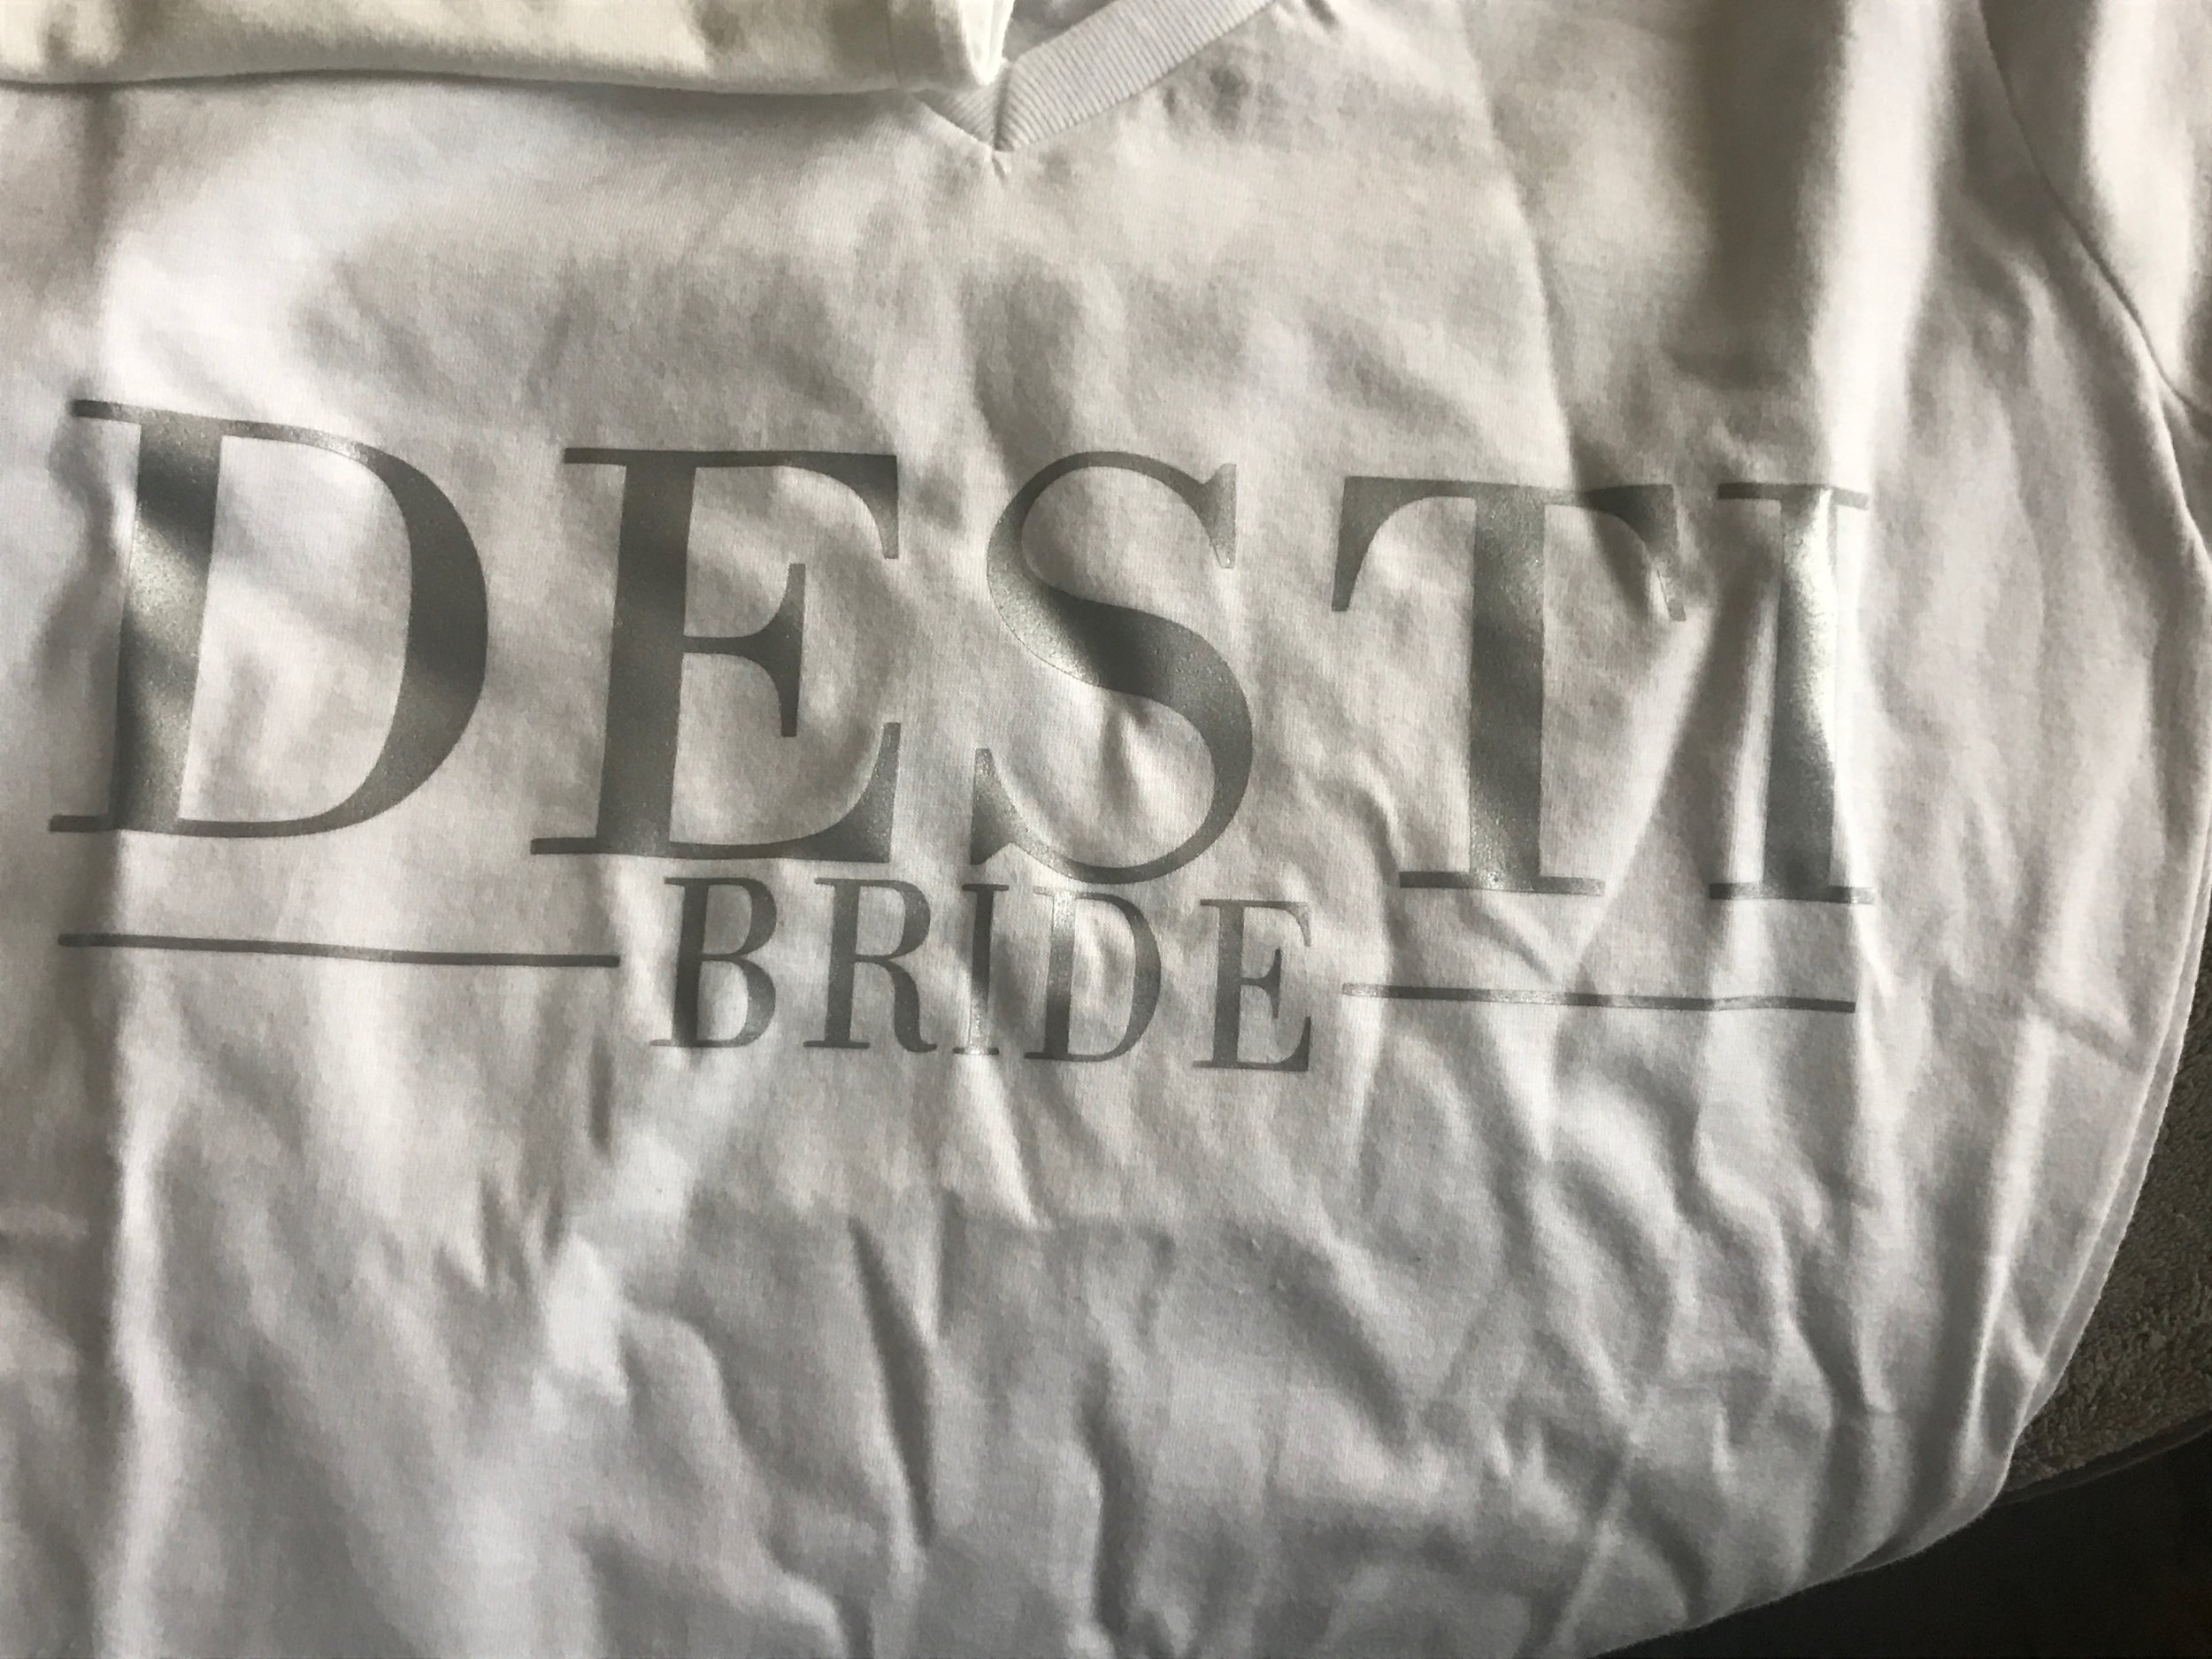 36 - Black Destination Wedding Bride - BlackDesti & Bridefriends - Journal - 36 Atlanta Destilorette Bachelorette 8 - Desti Bride Shirt.JPG